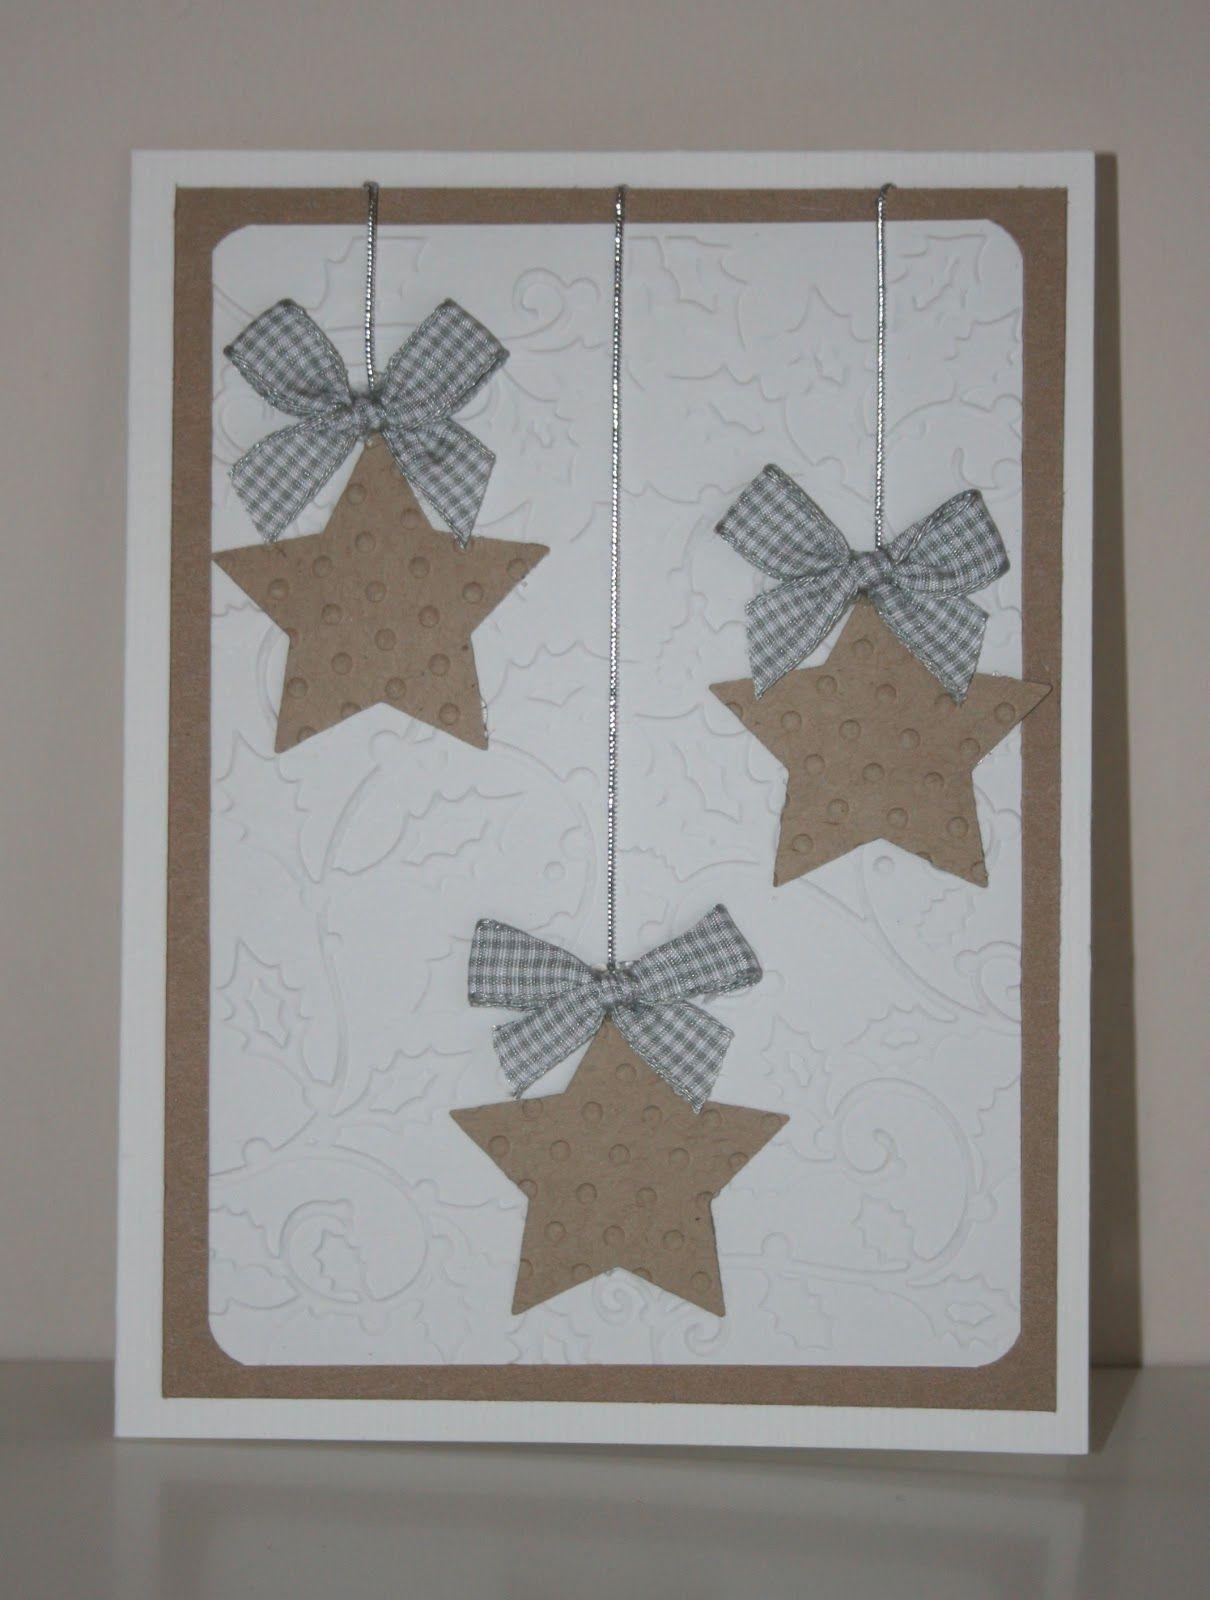 Tarjeta De Navidad Con Estrellas Navidad Pinterest Tarjetas - Manualidades-de-tarjetas-navideas